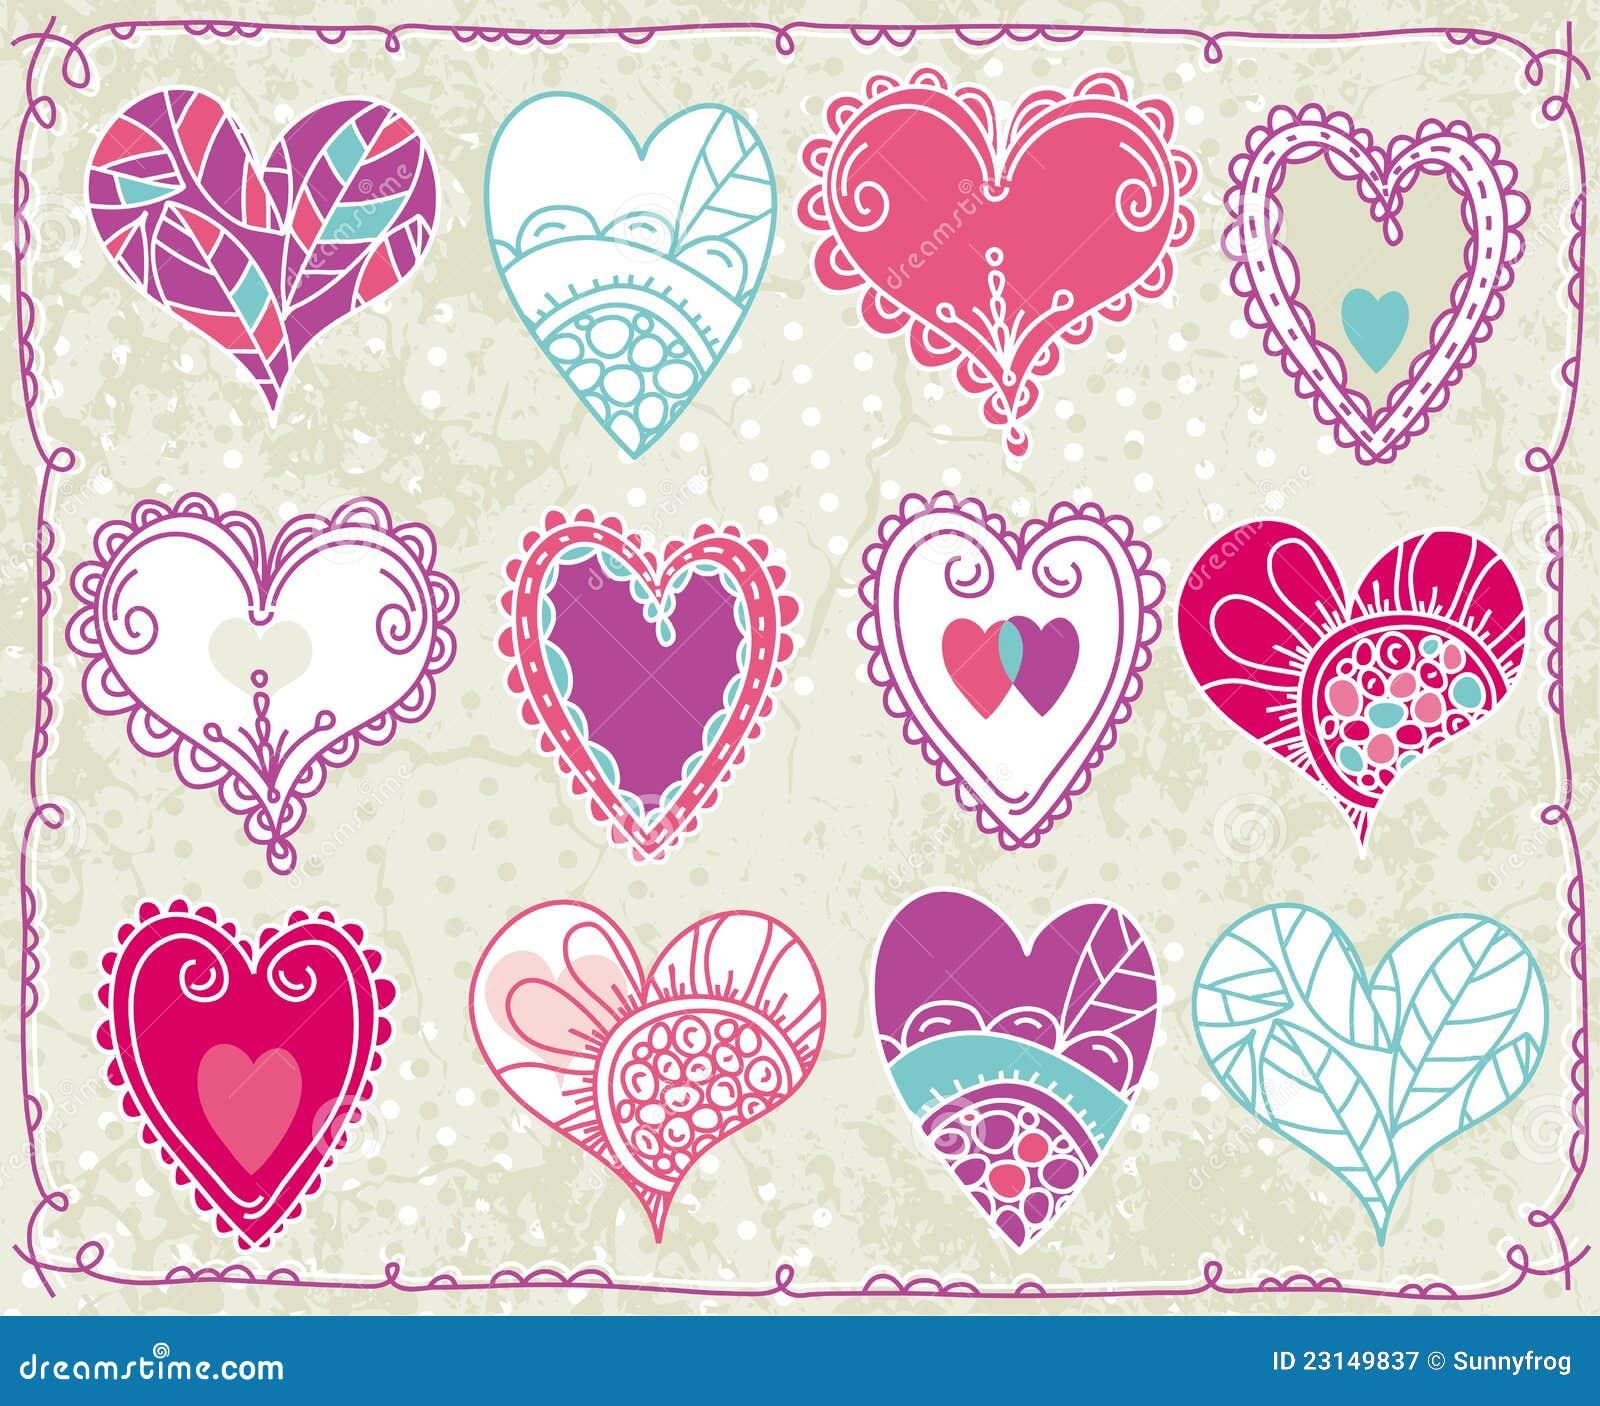 dd7f5339e089bf Doze Valentim Coração, Vetor Ilustração do Vetor - Ilustração de ...